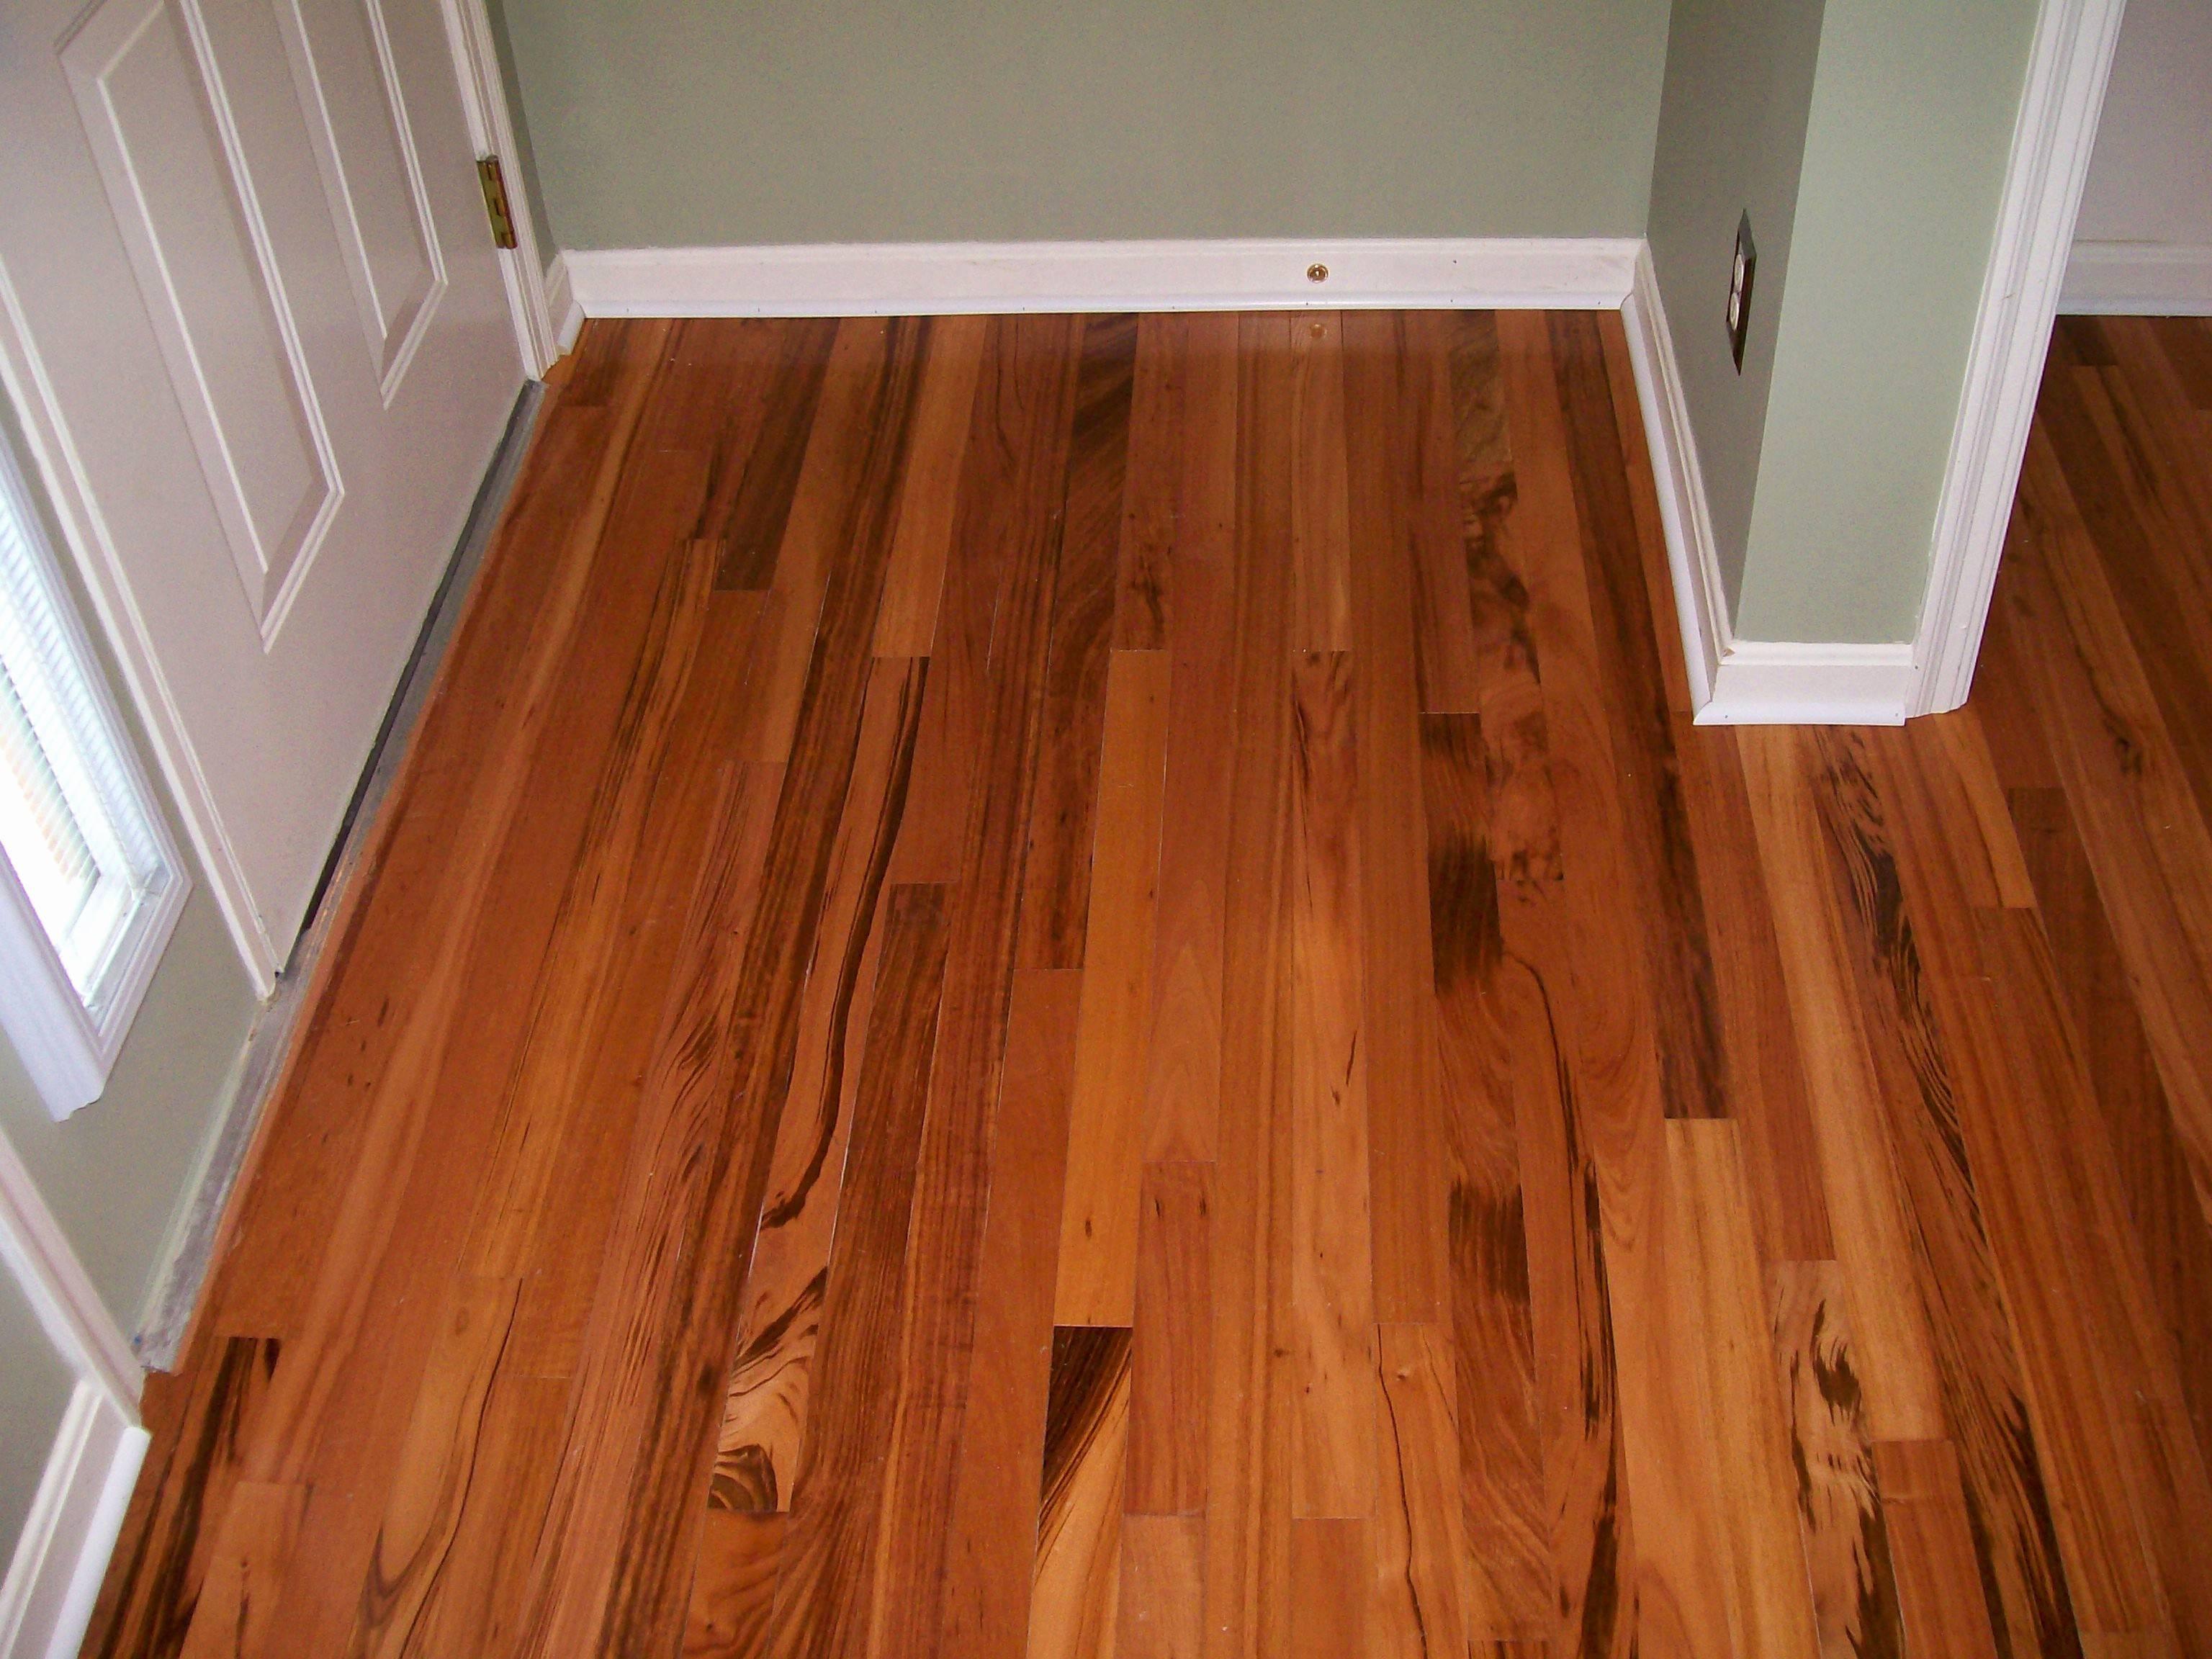 hardwood flooring cost of 17 new cost of hardwood floor installation pics dizpos in cost of hardwood floor installation new 50 fresh estimated cost installing hardwood floors 50 photos o